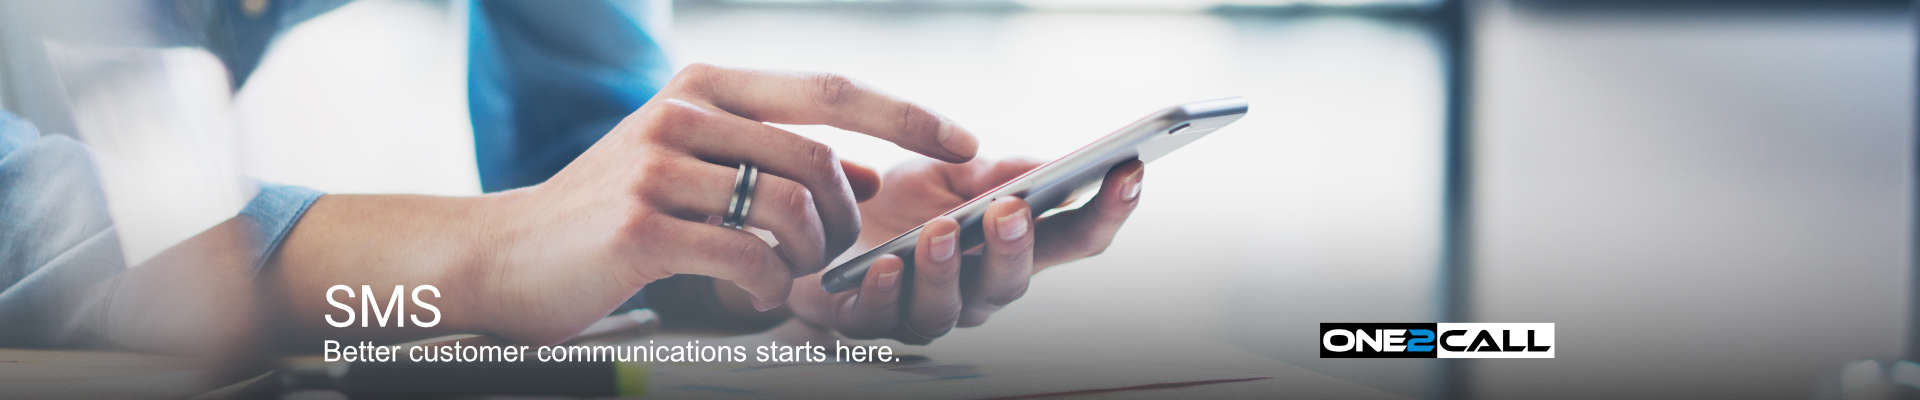 SMS - Better customer communications starts here.